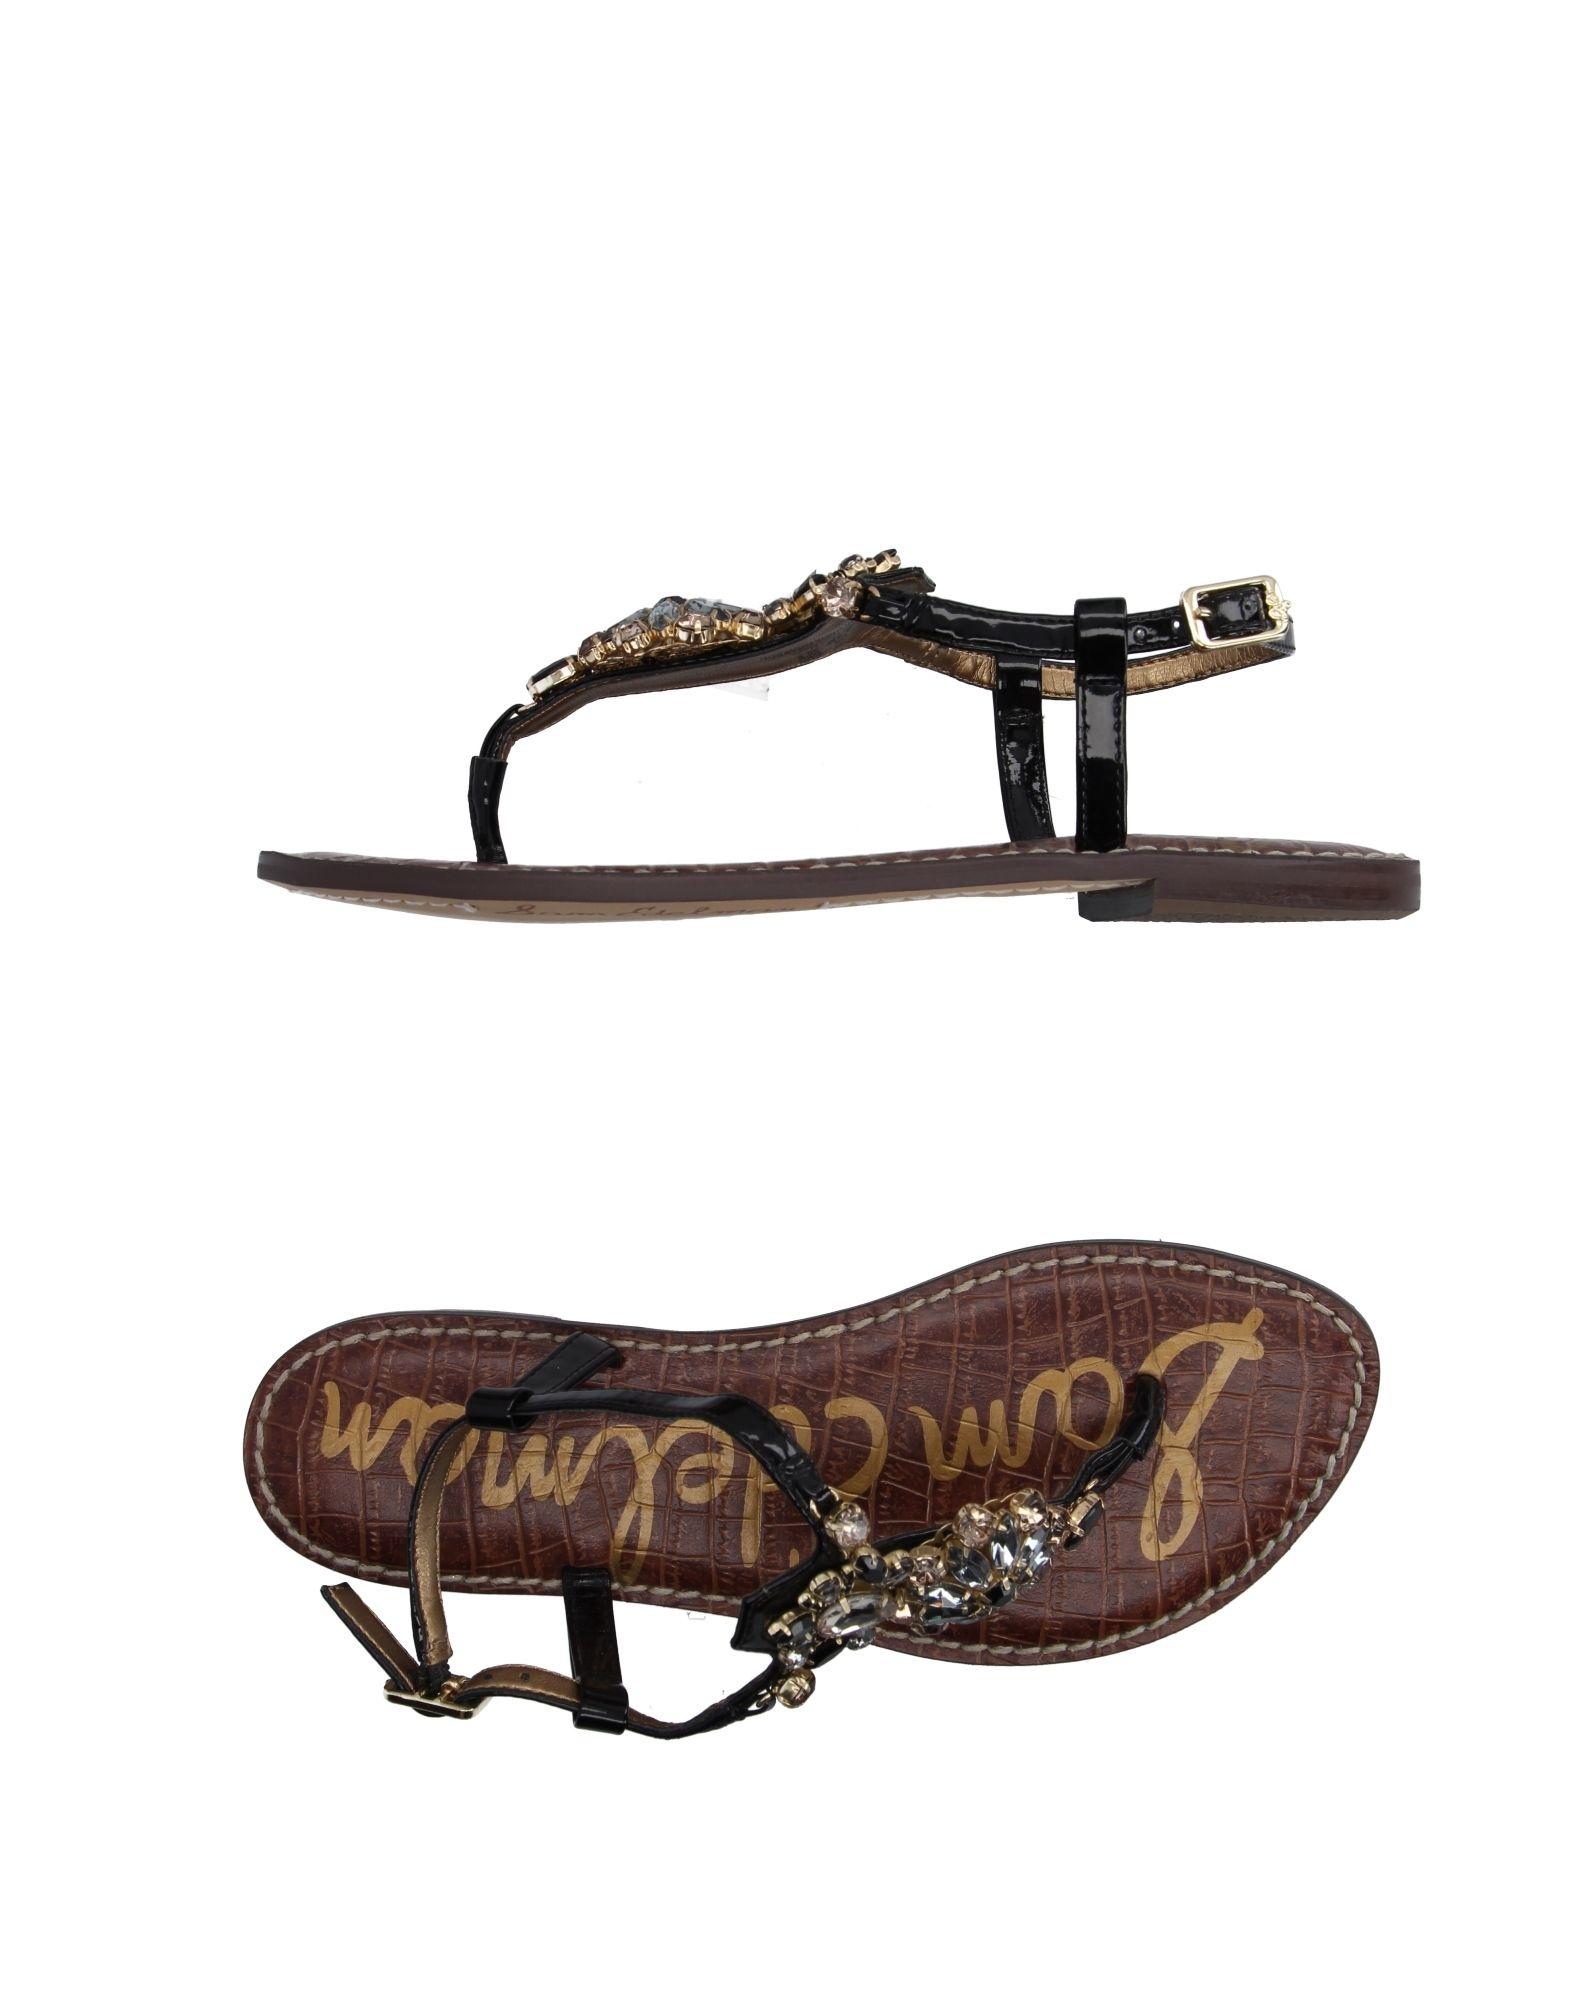 Sam Edelman Slingback Flat Shoes